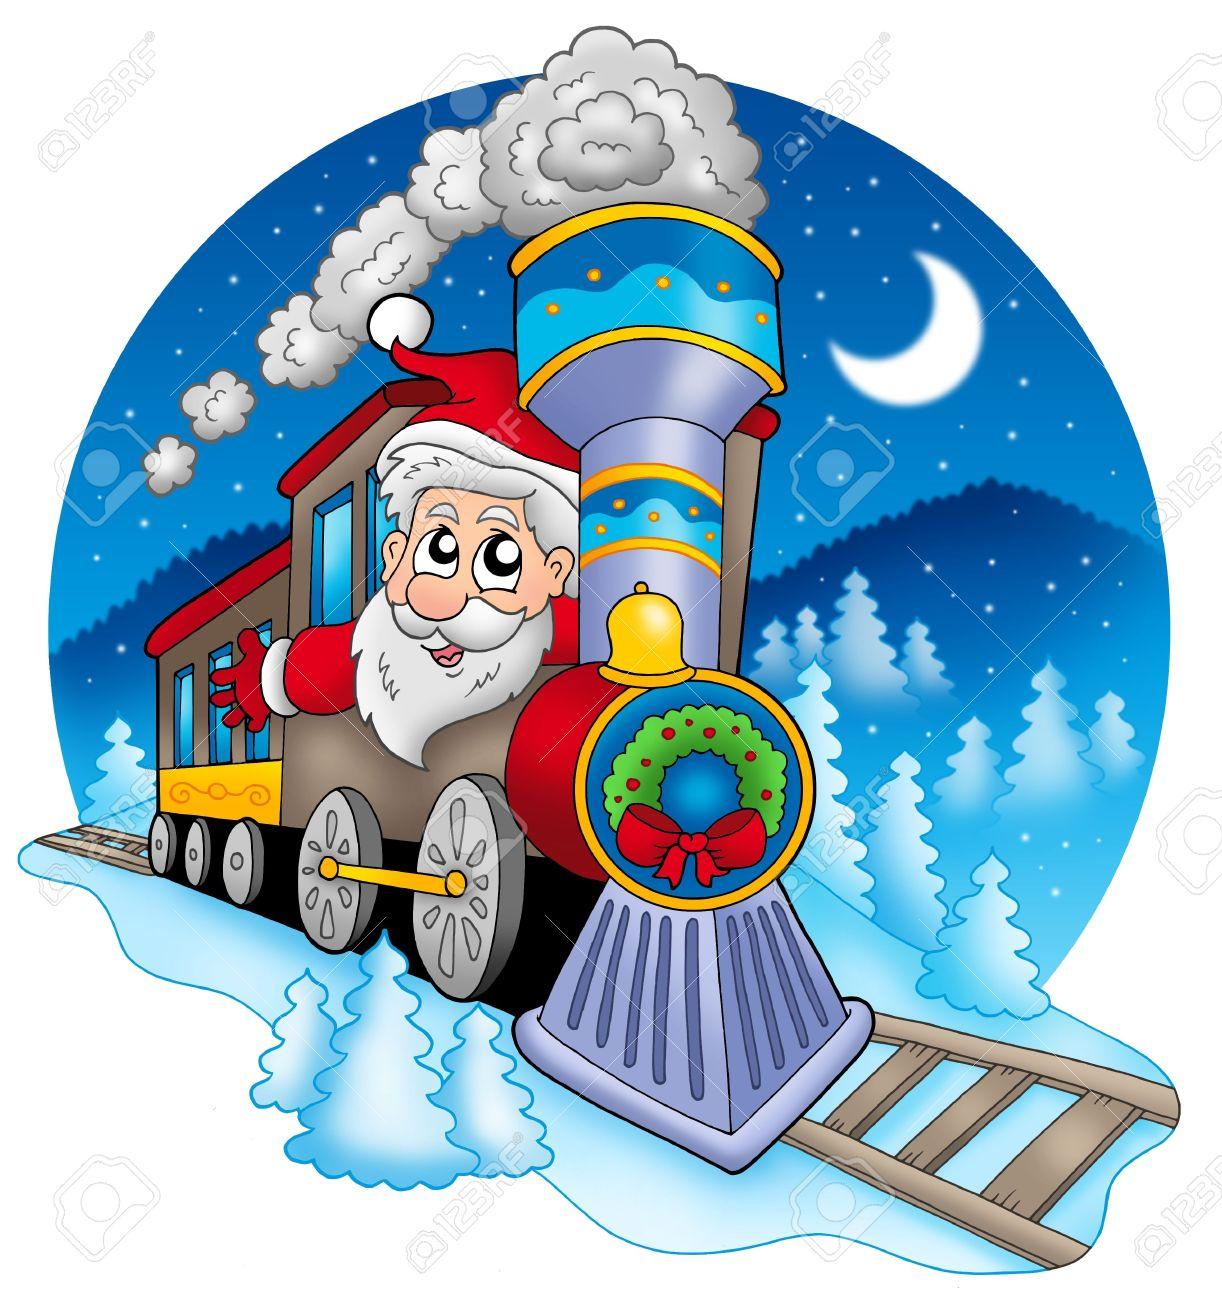 hight resolution of santa claus in train color illustration stock illustration 5682328